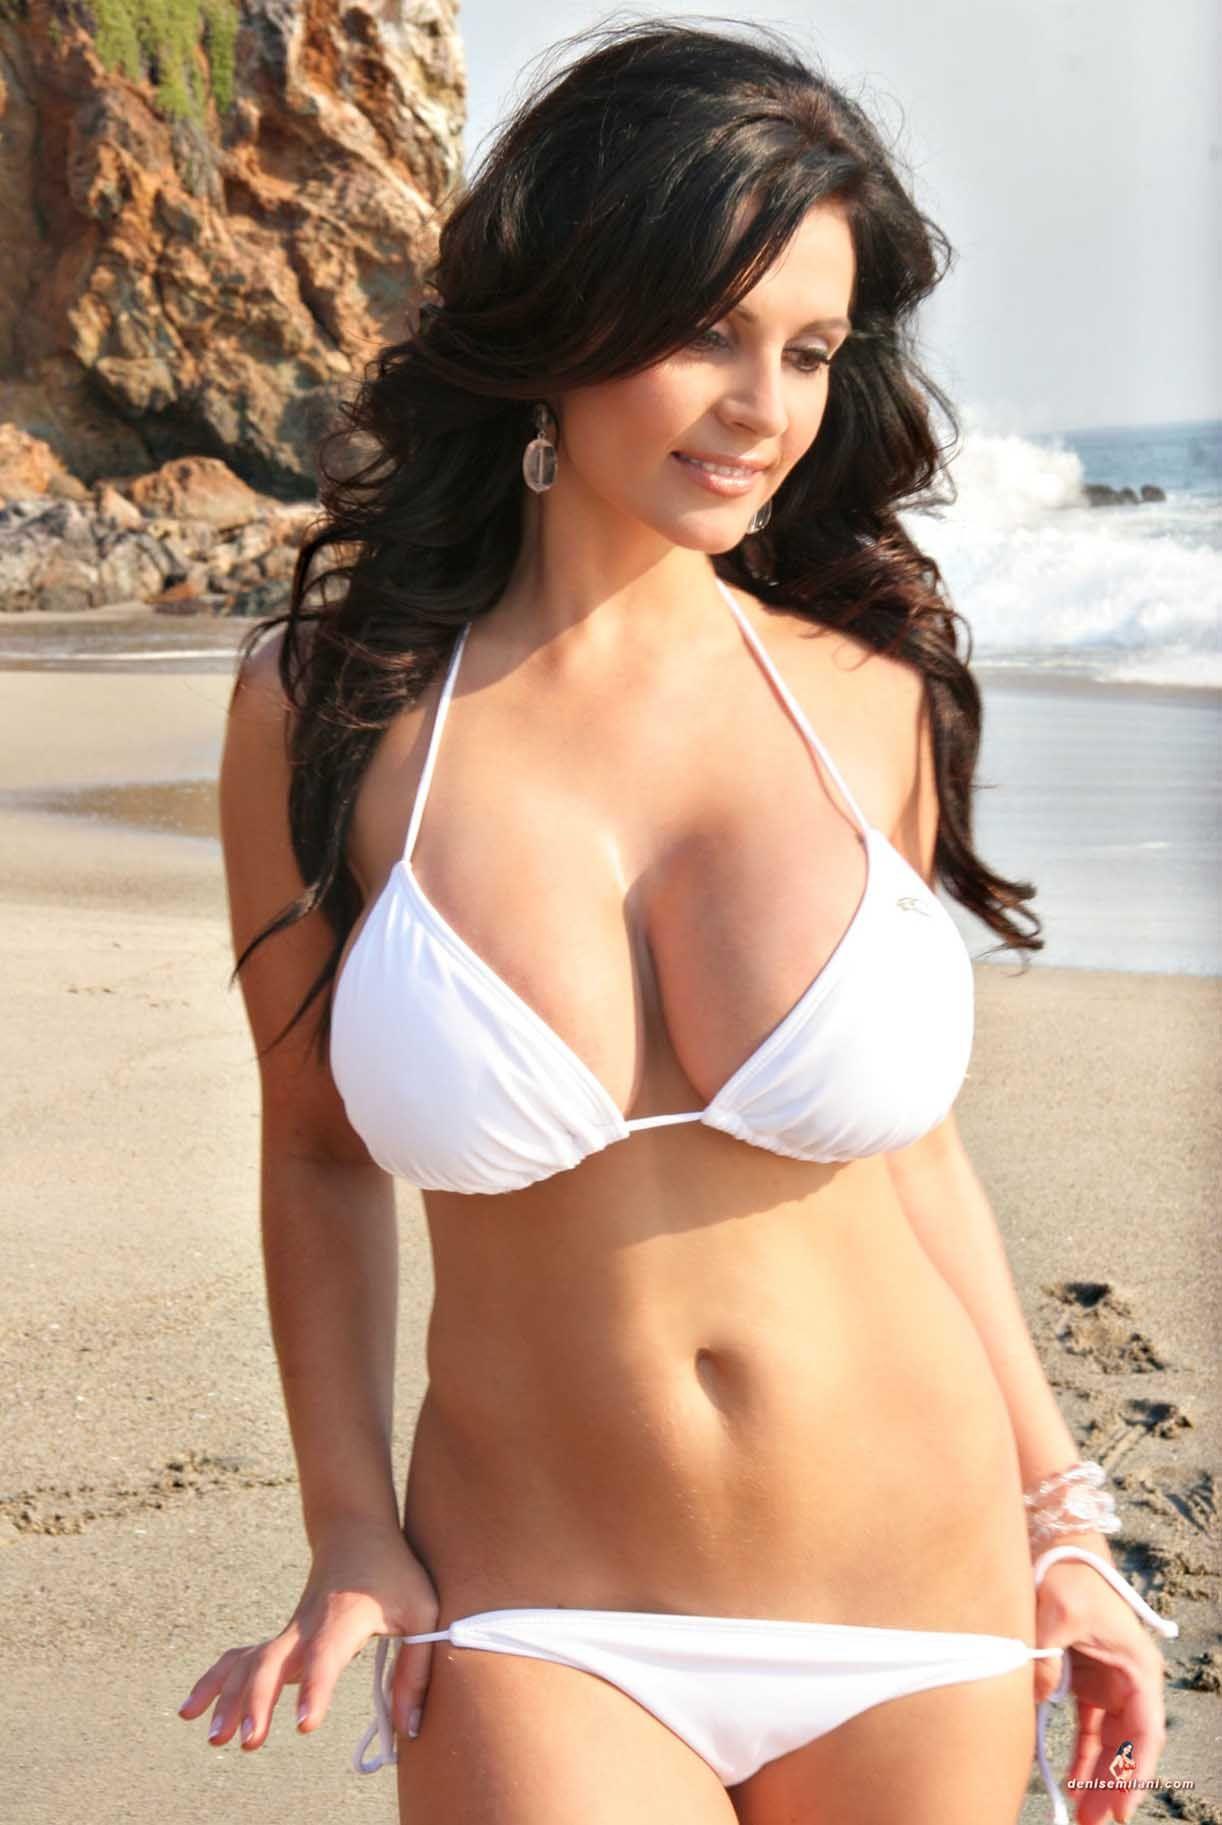 Denise milani white bikini